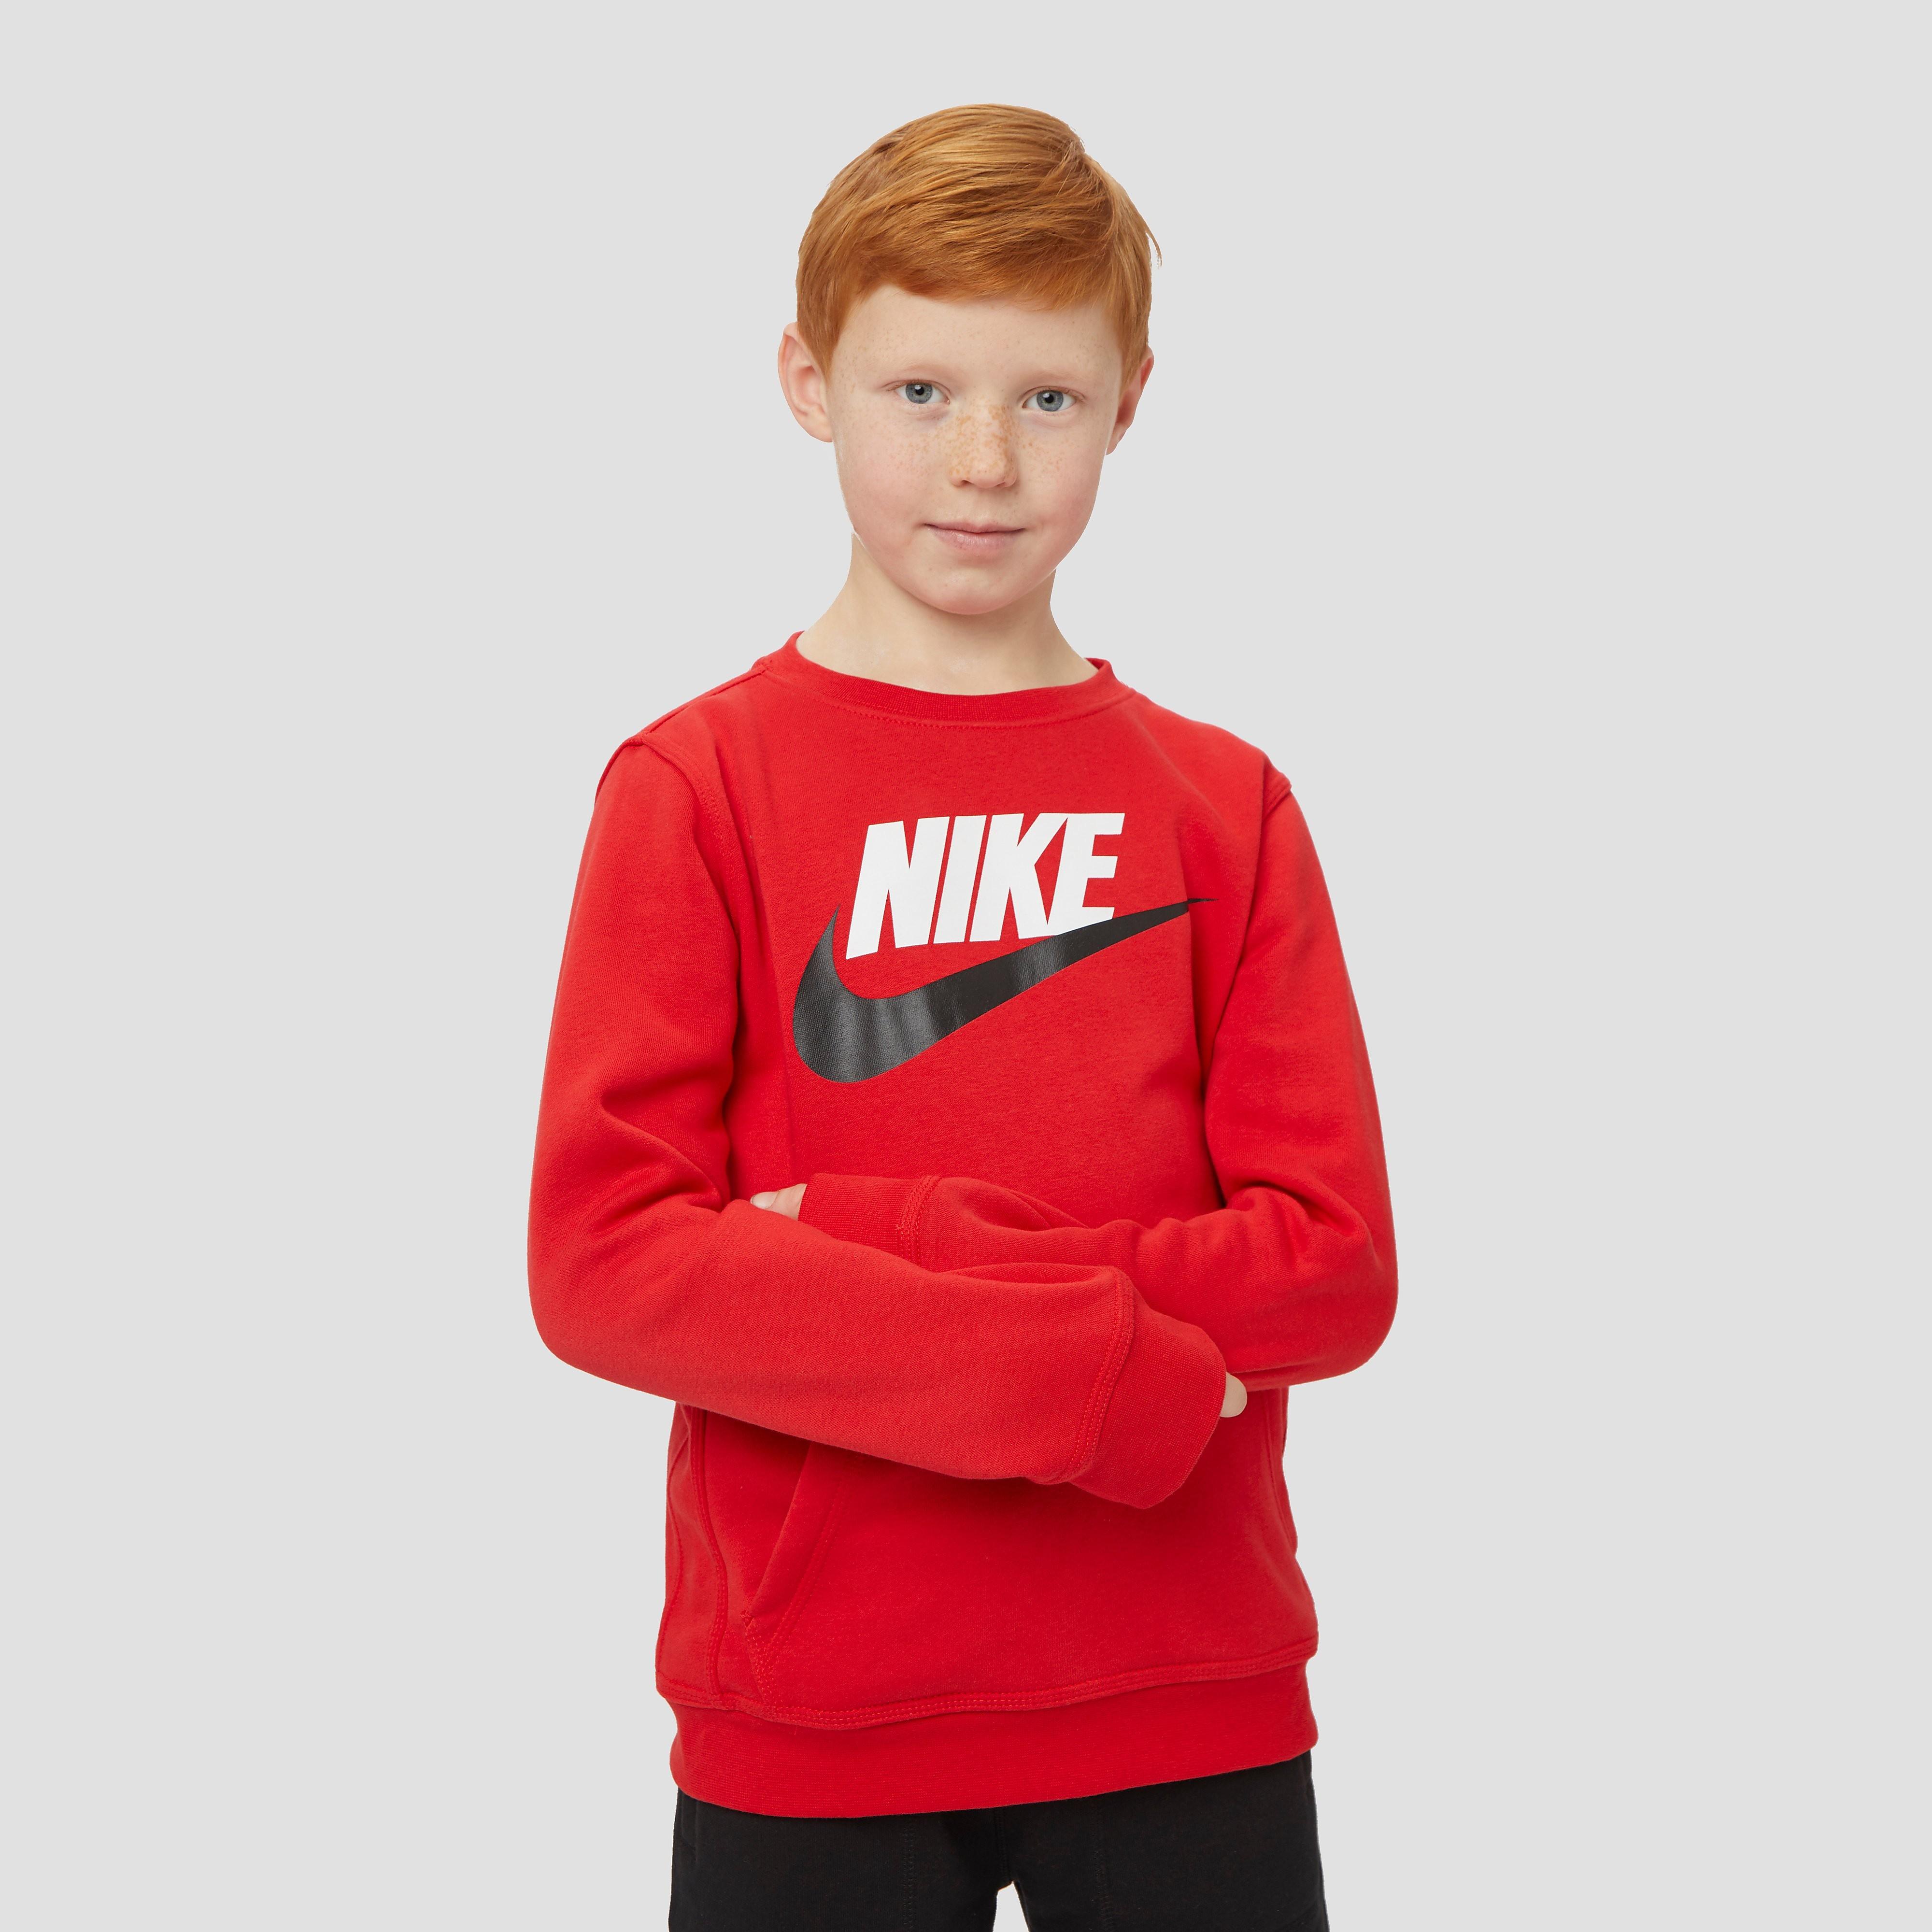 NIKE Sportswear club fleece sweater rood kinderen Kinderen